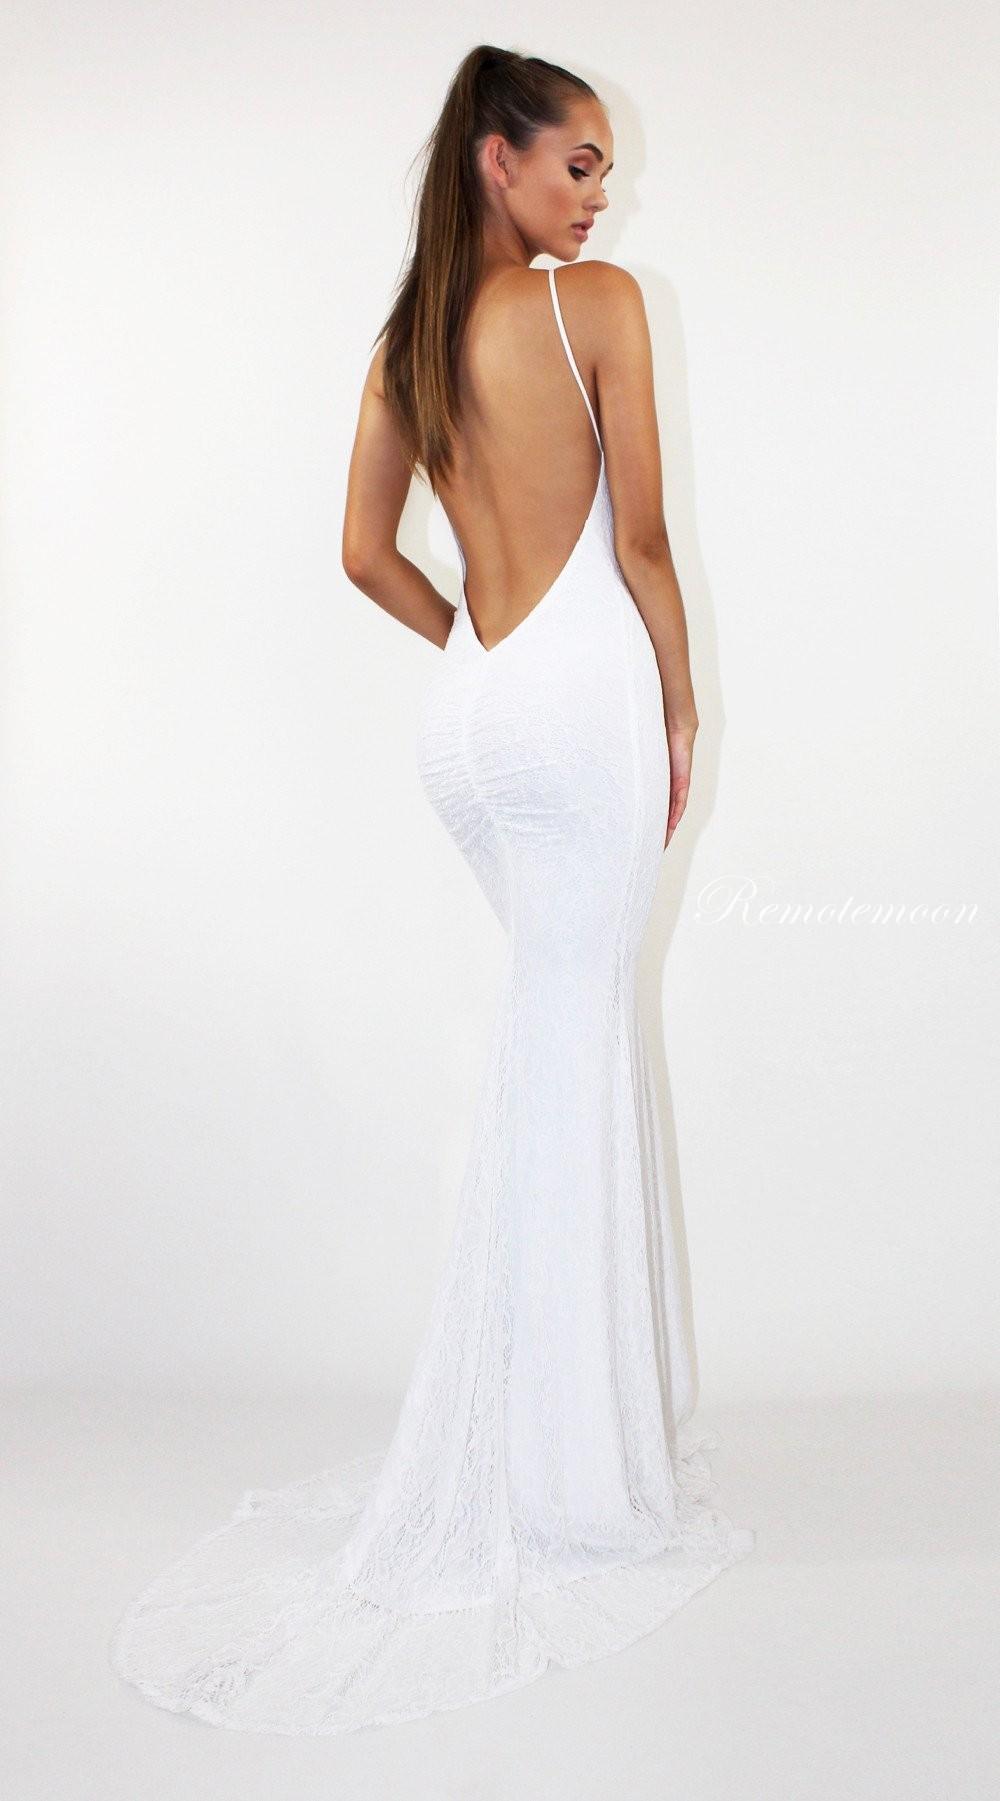 White Lace Backless Mermaid Wedding Dress Halter Neckline Low Cut Back Boho  Beach Wedding Dresses 2018 ... e5133800a